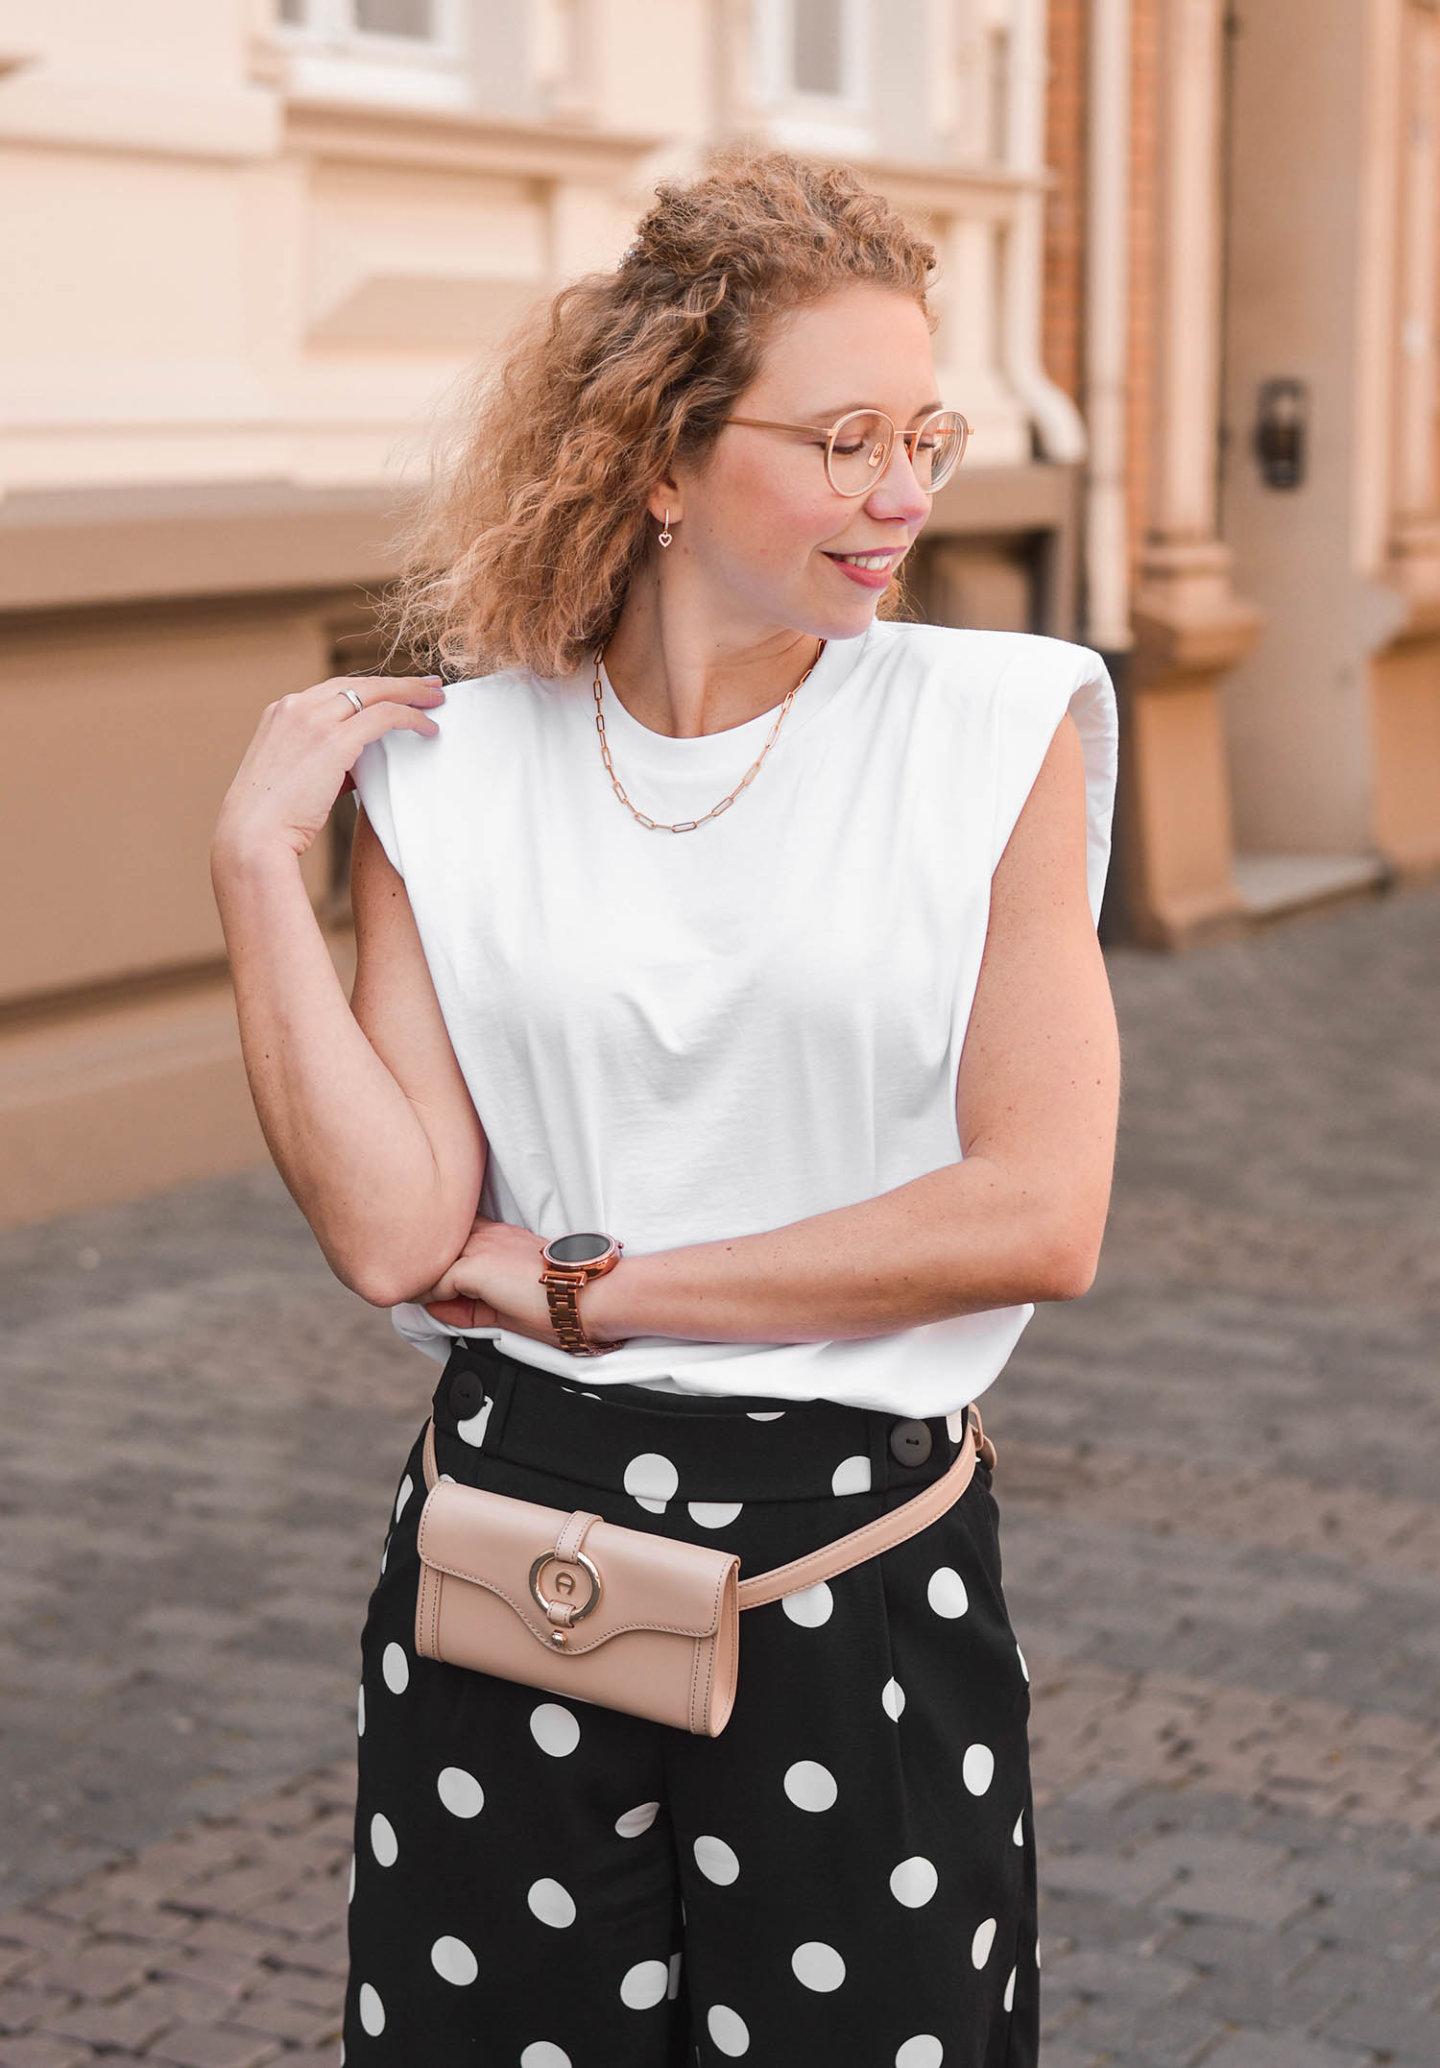 blogger style mit schulterpolster-shirt